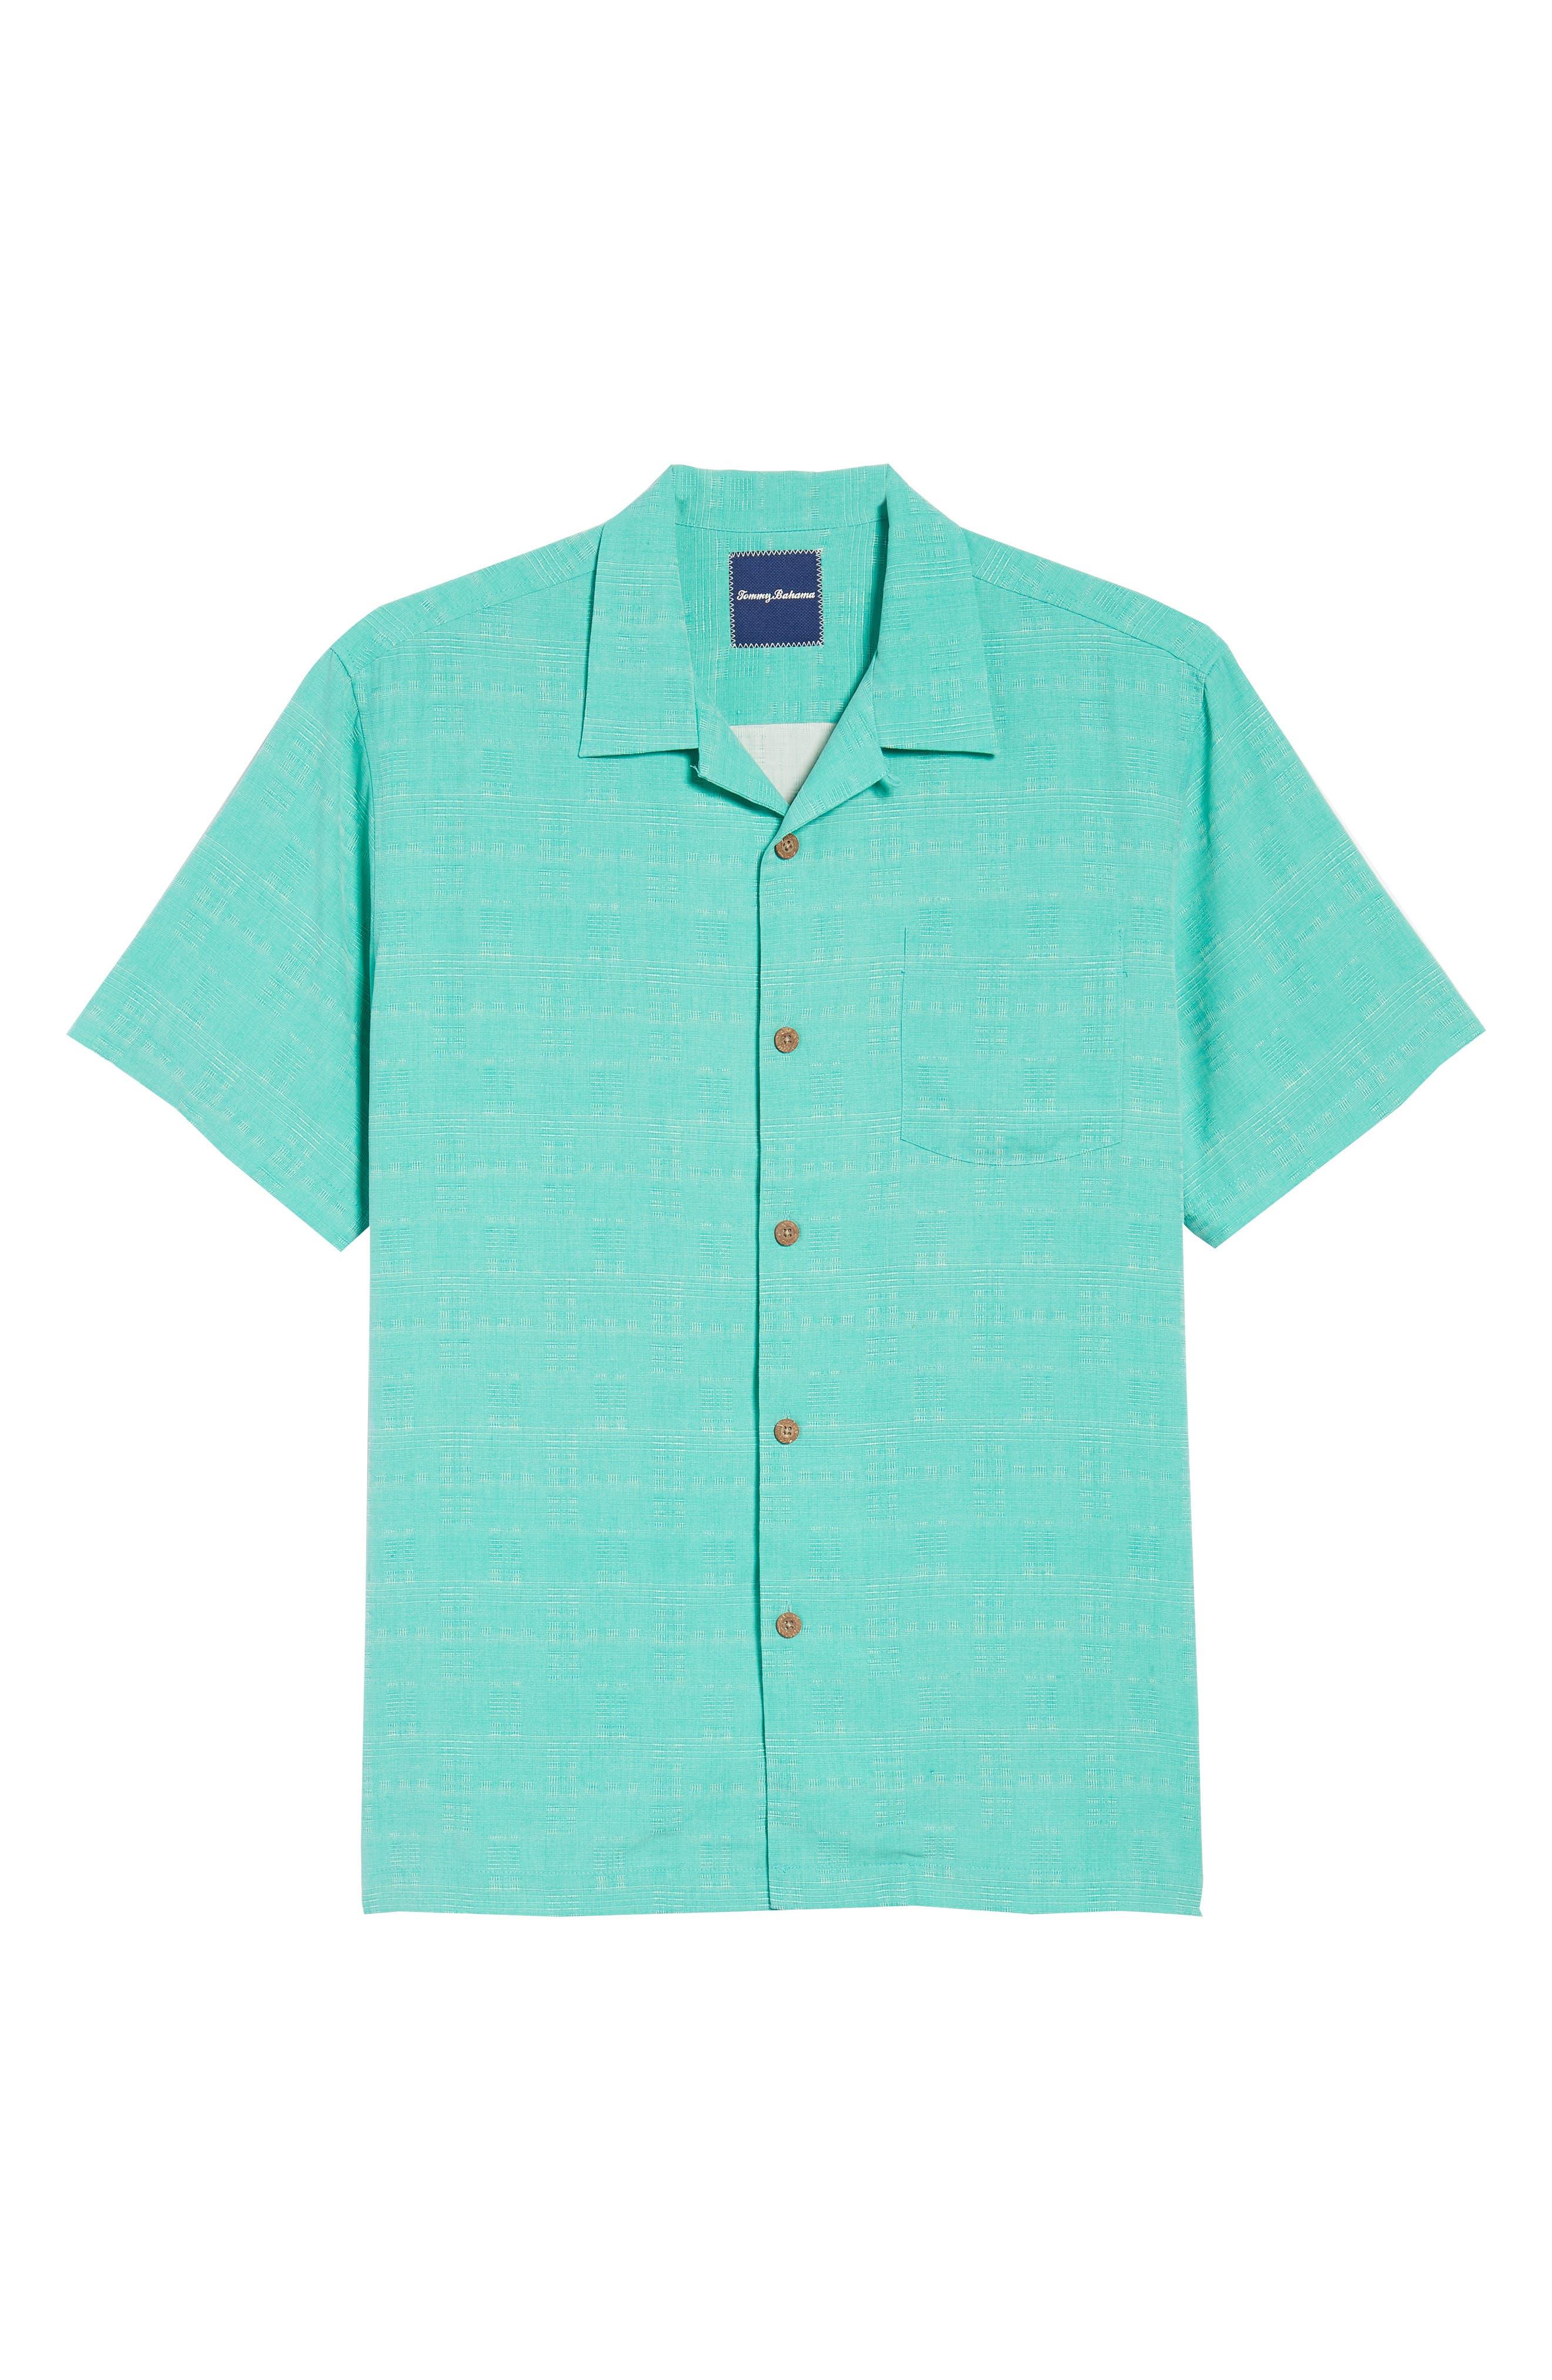 'Geo-Rific Jacquard' Original Fit Silk Camp Shirt,                             Alternate thumbnail 42, color,